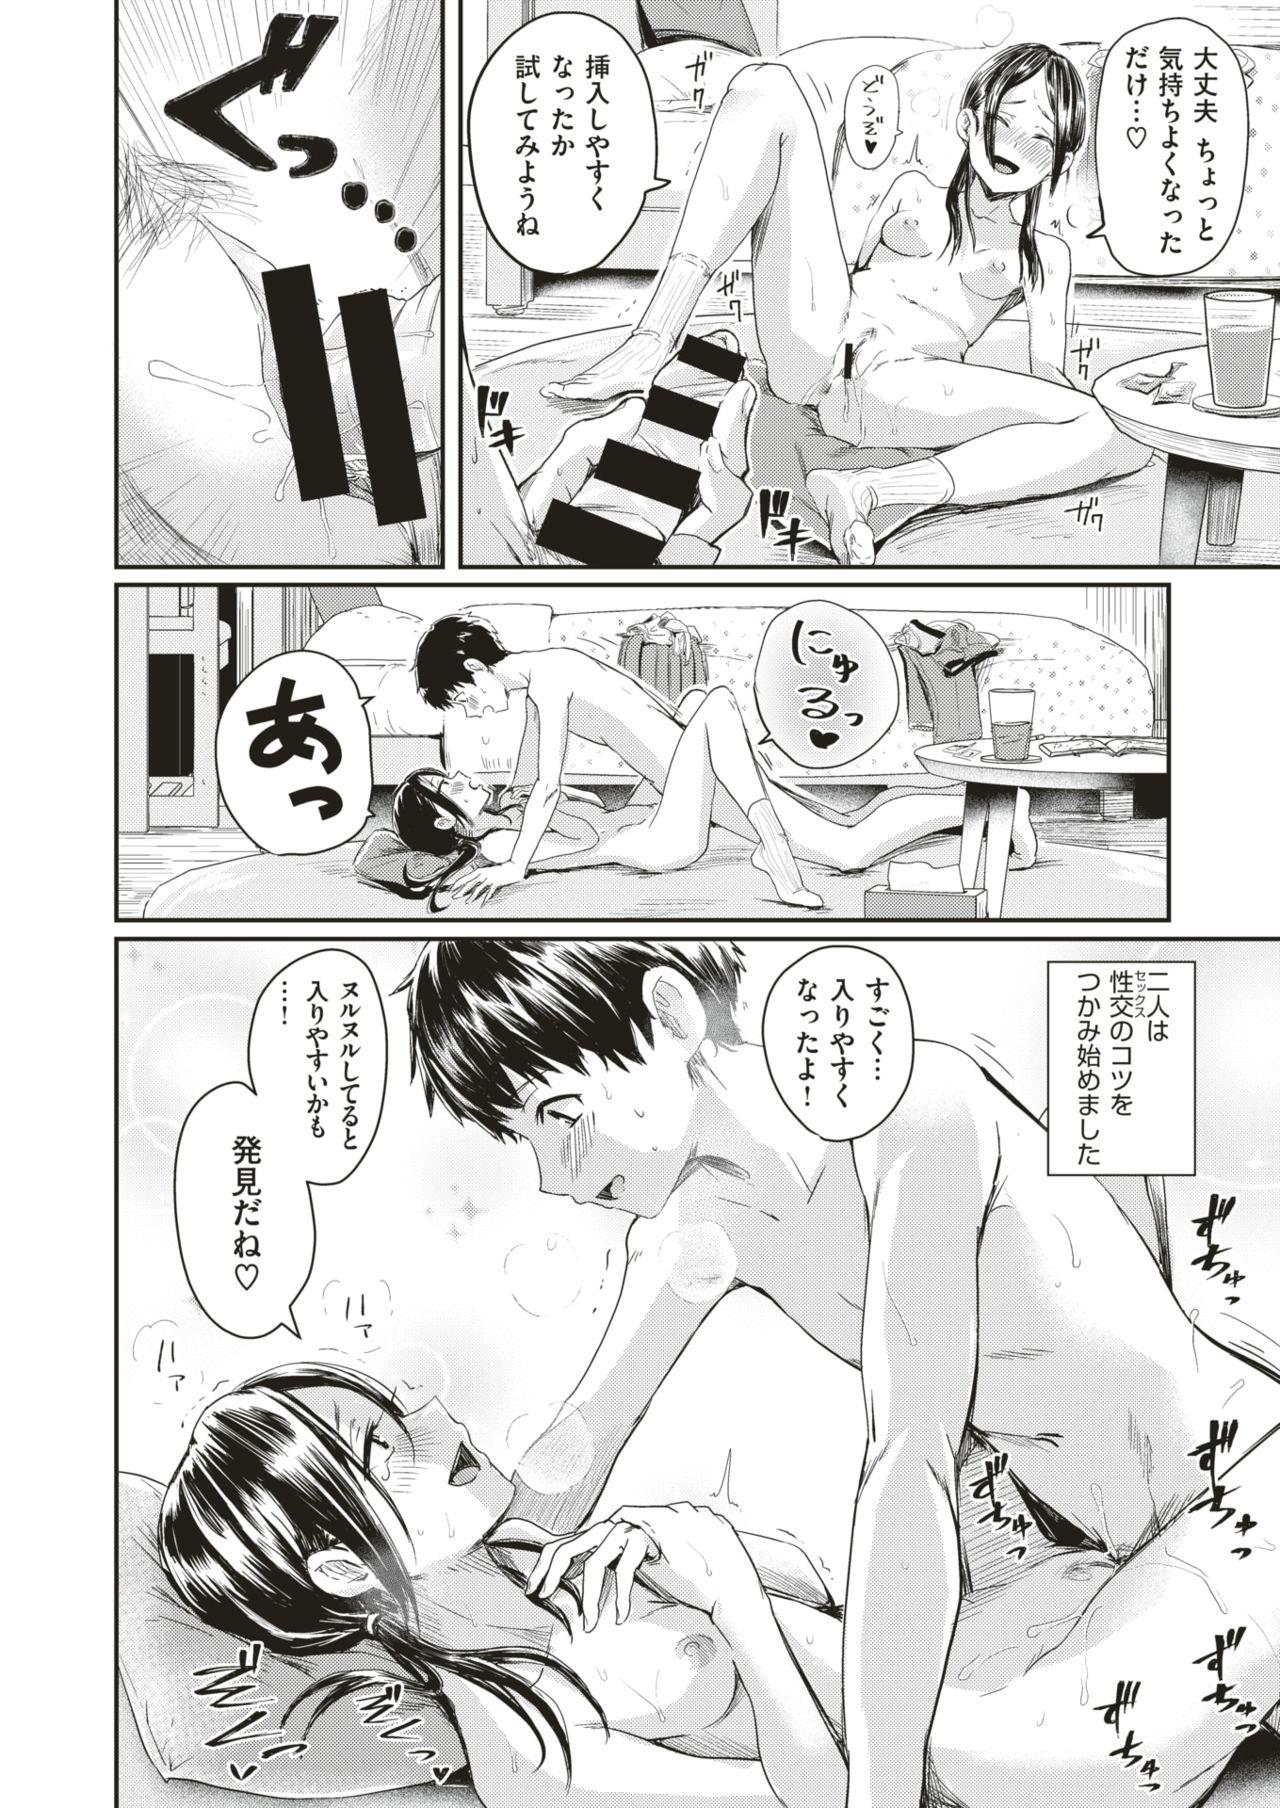 COMIC HAPPINING Vol. 4 14